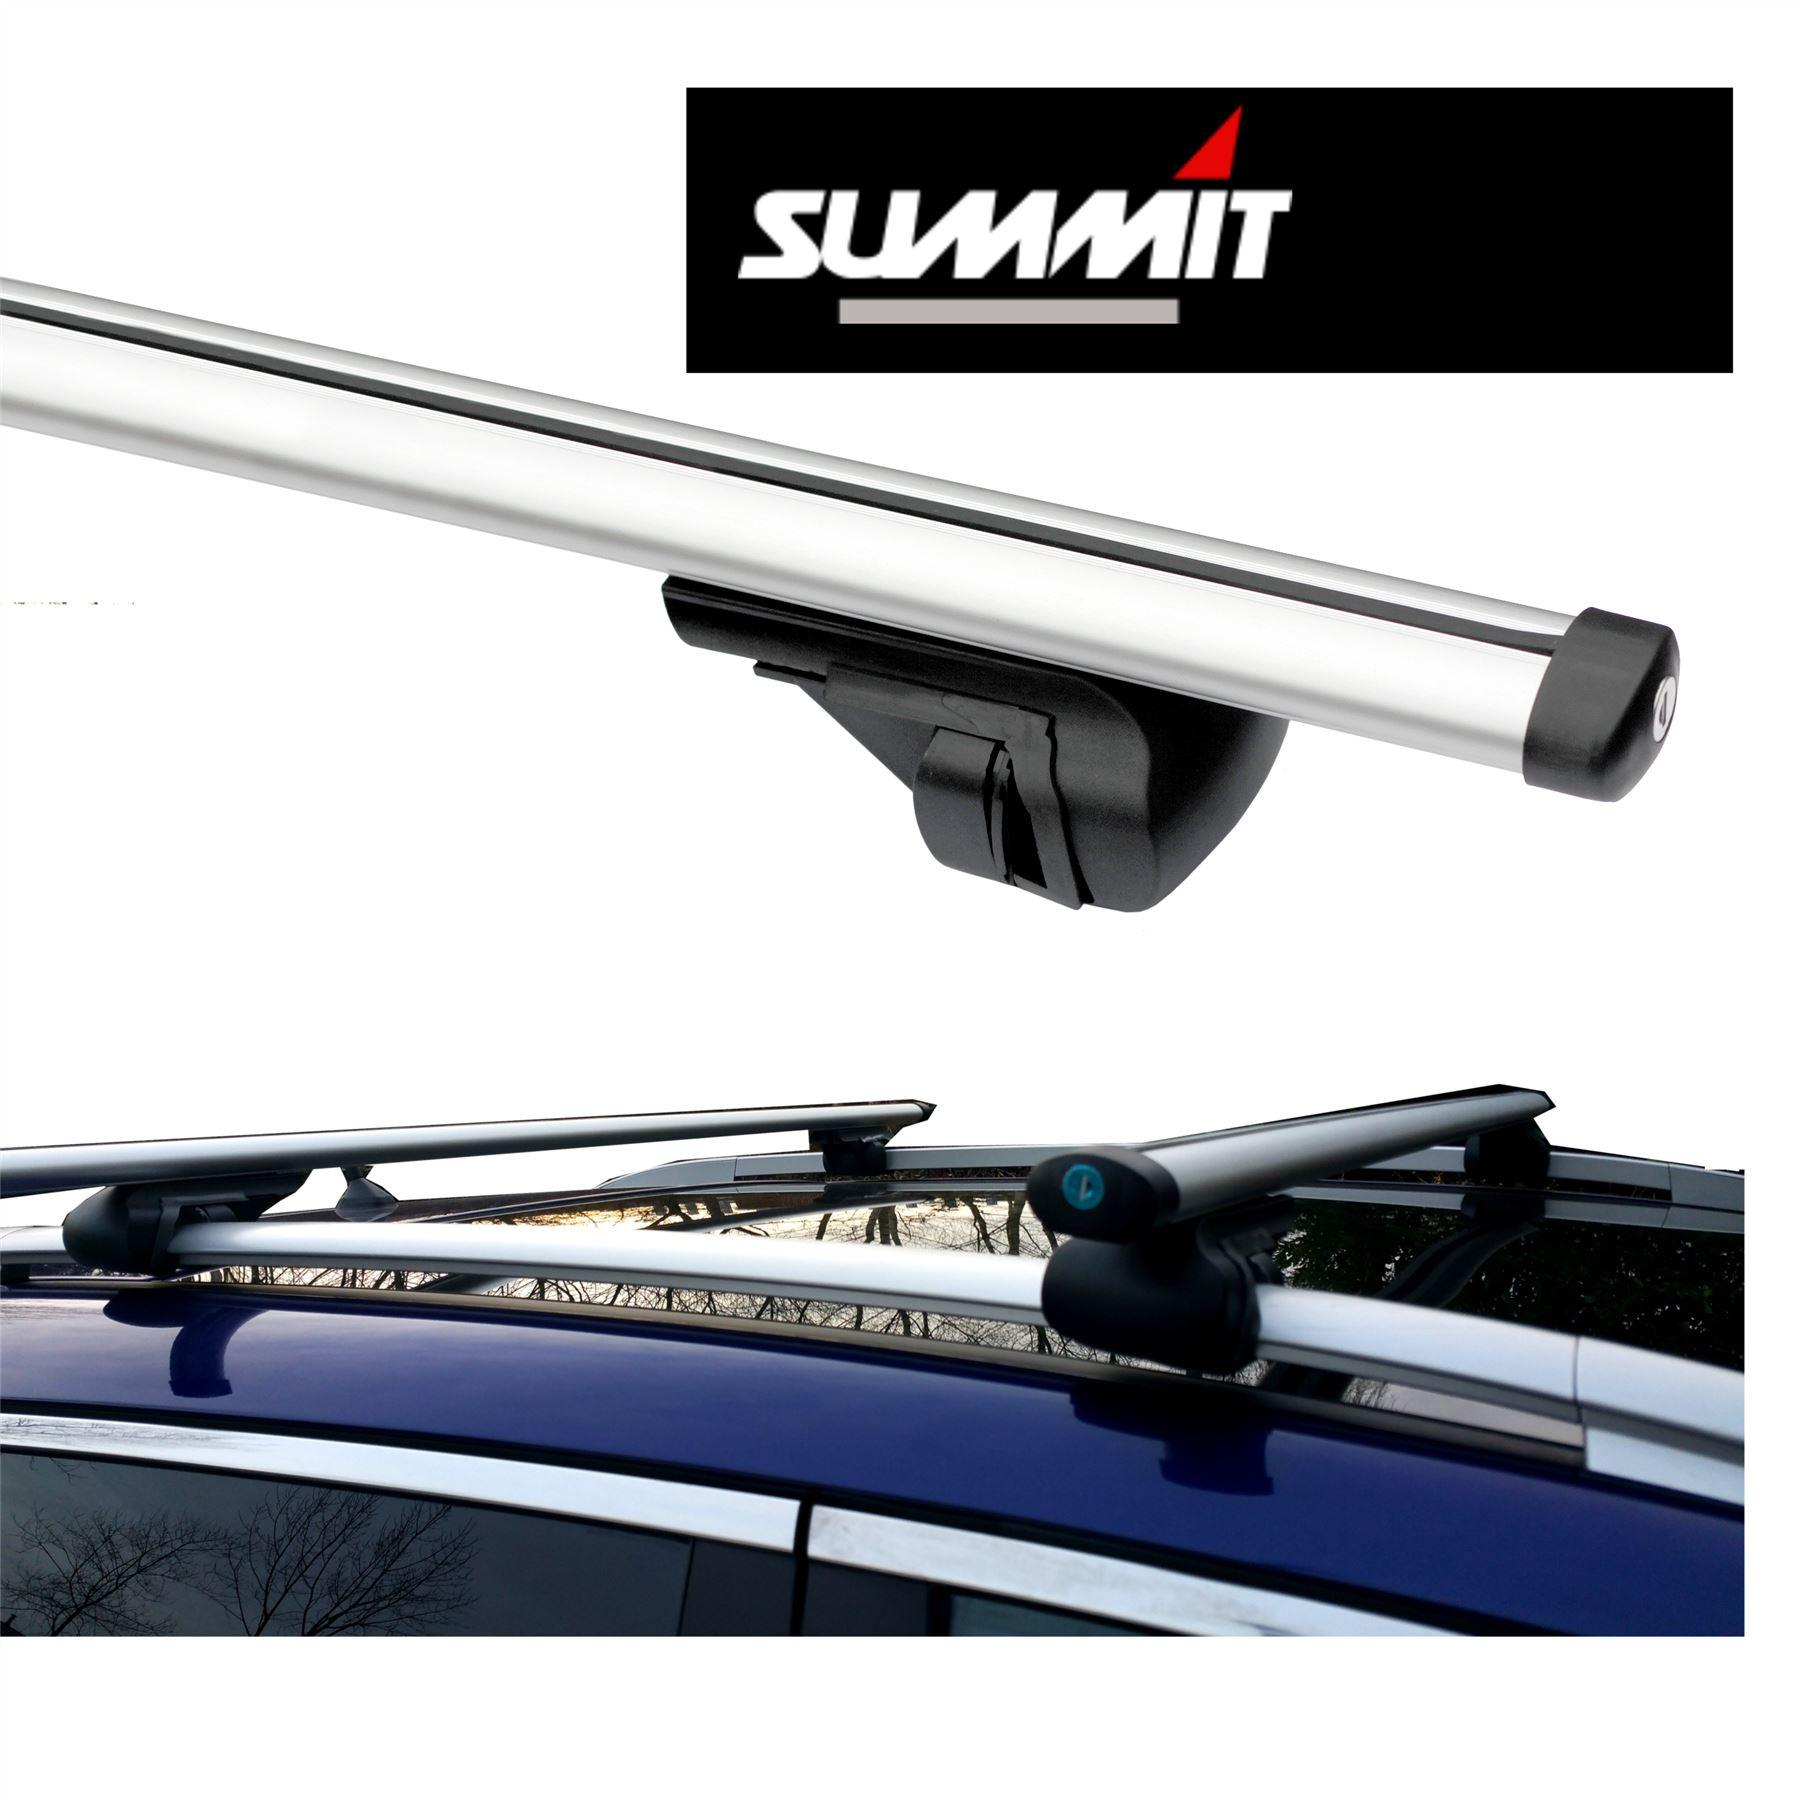 Vauxhall Antara 5 door 07-13 Summit roof bars for cars with running rails